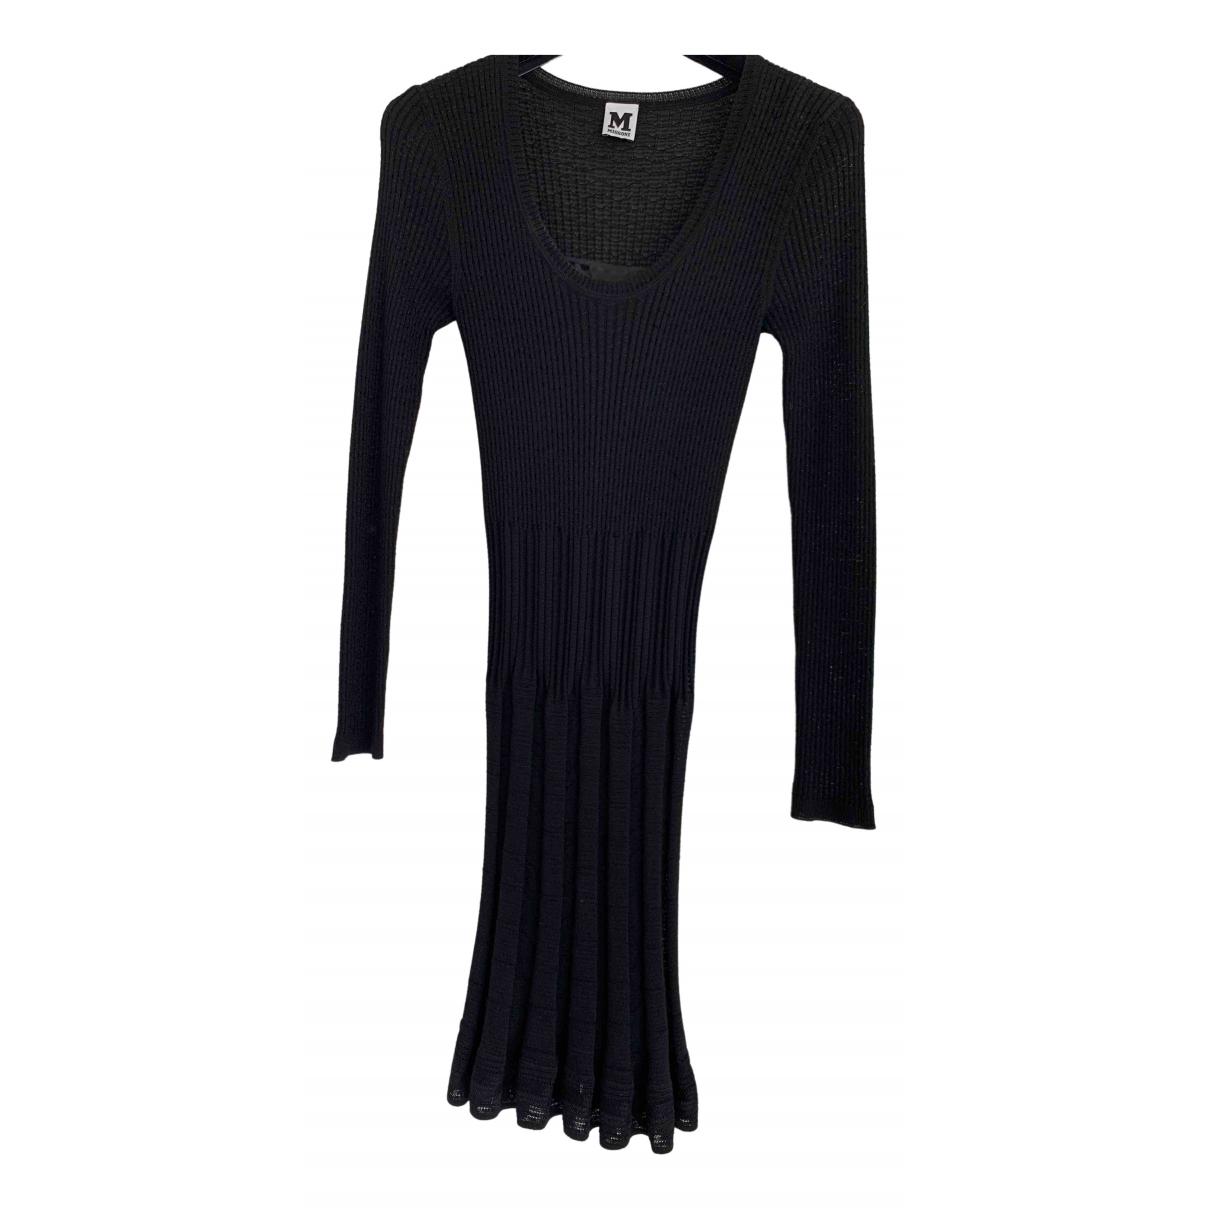 M Missoni N Black Wool dress for Women 44 IT